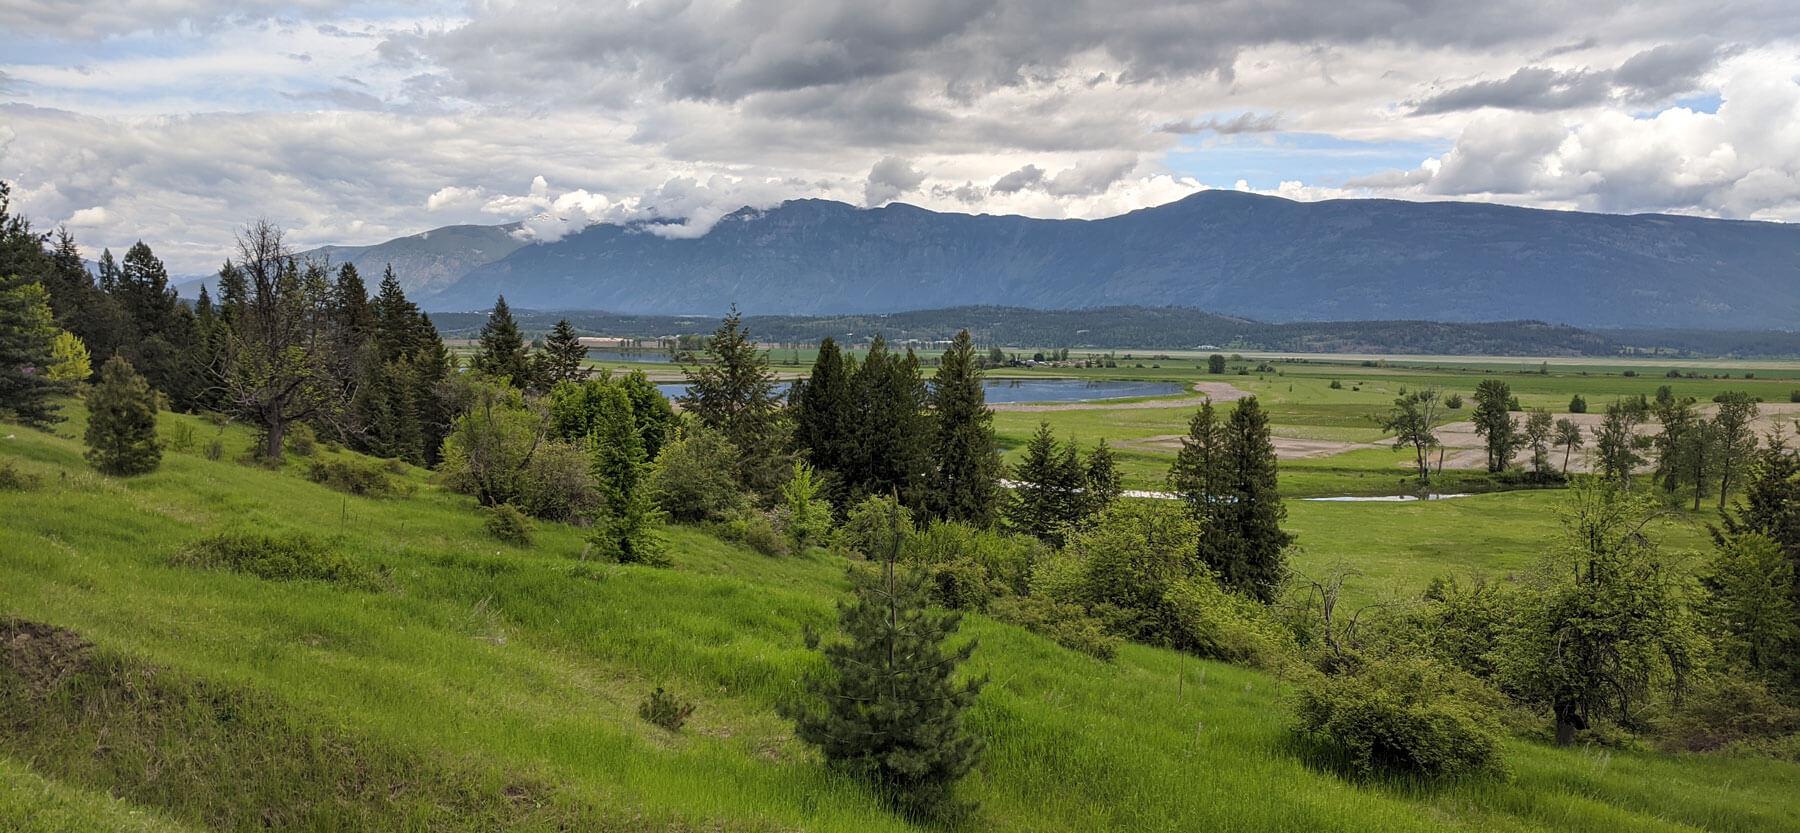 Kootenai Valley, northern Idaho